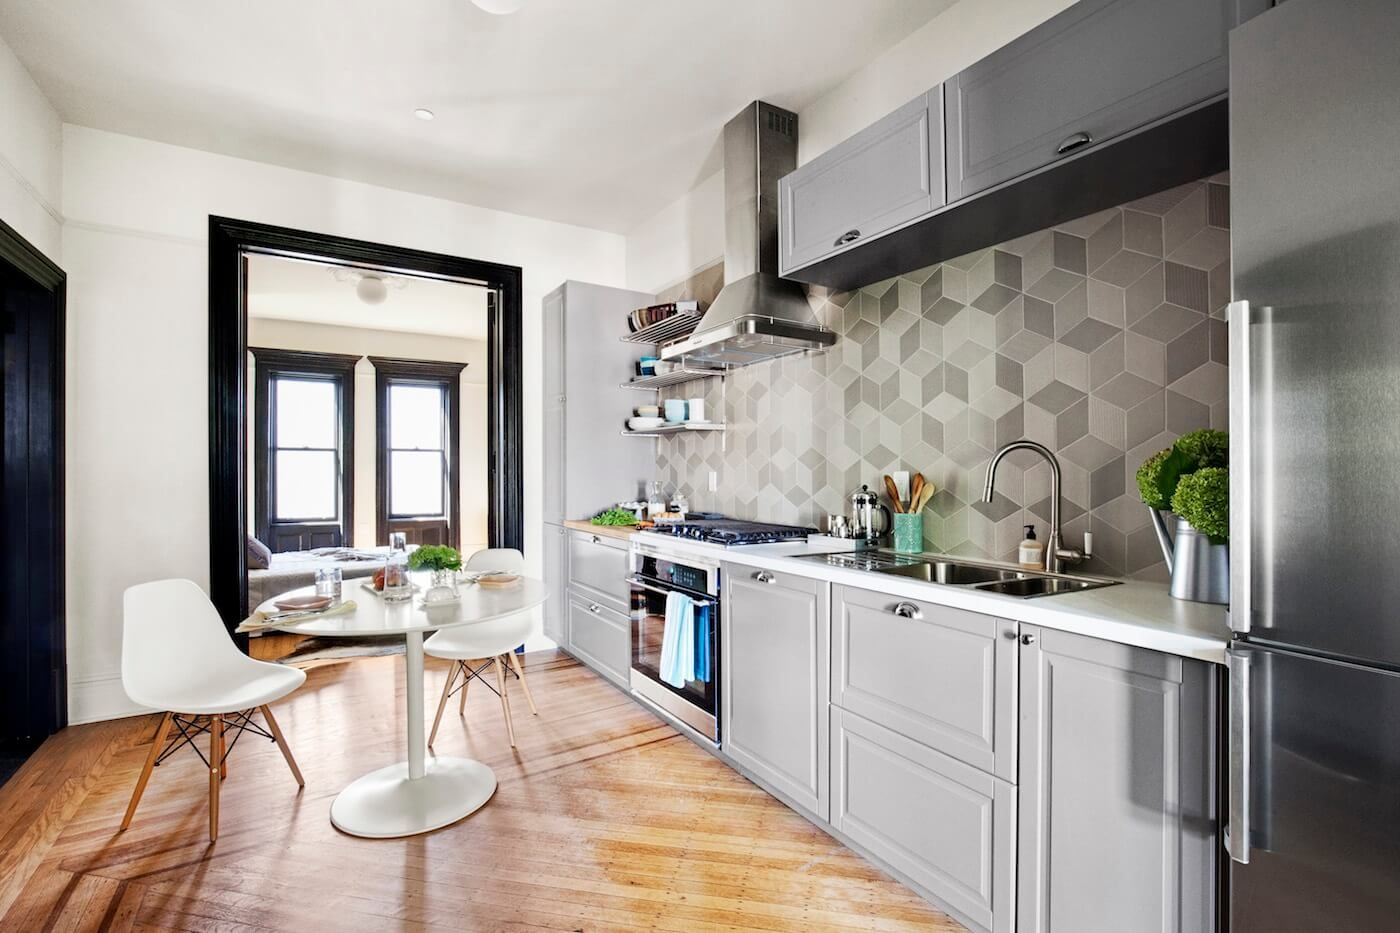 Interior Design Ideas Brooklyn MNDPC Architects Crown Heights ...